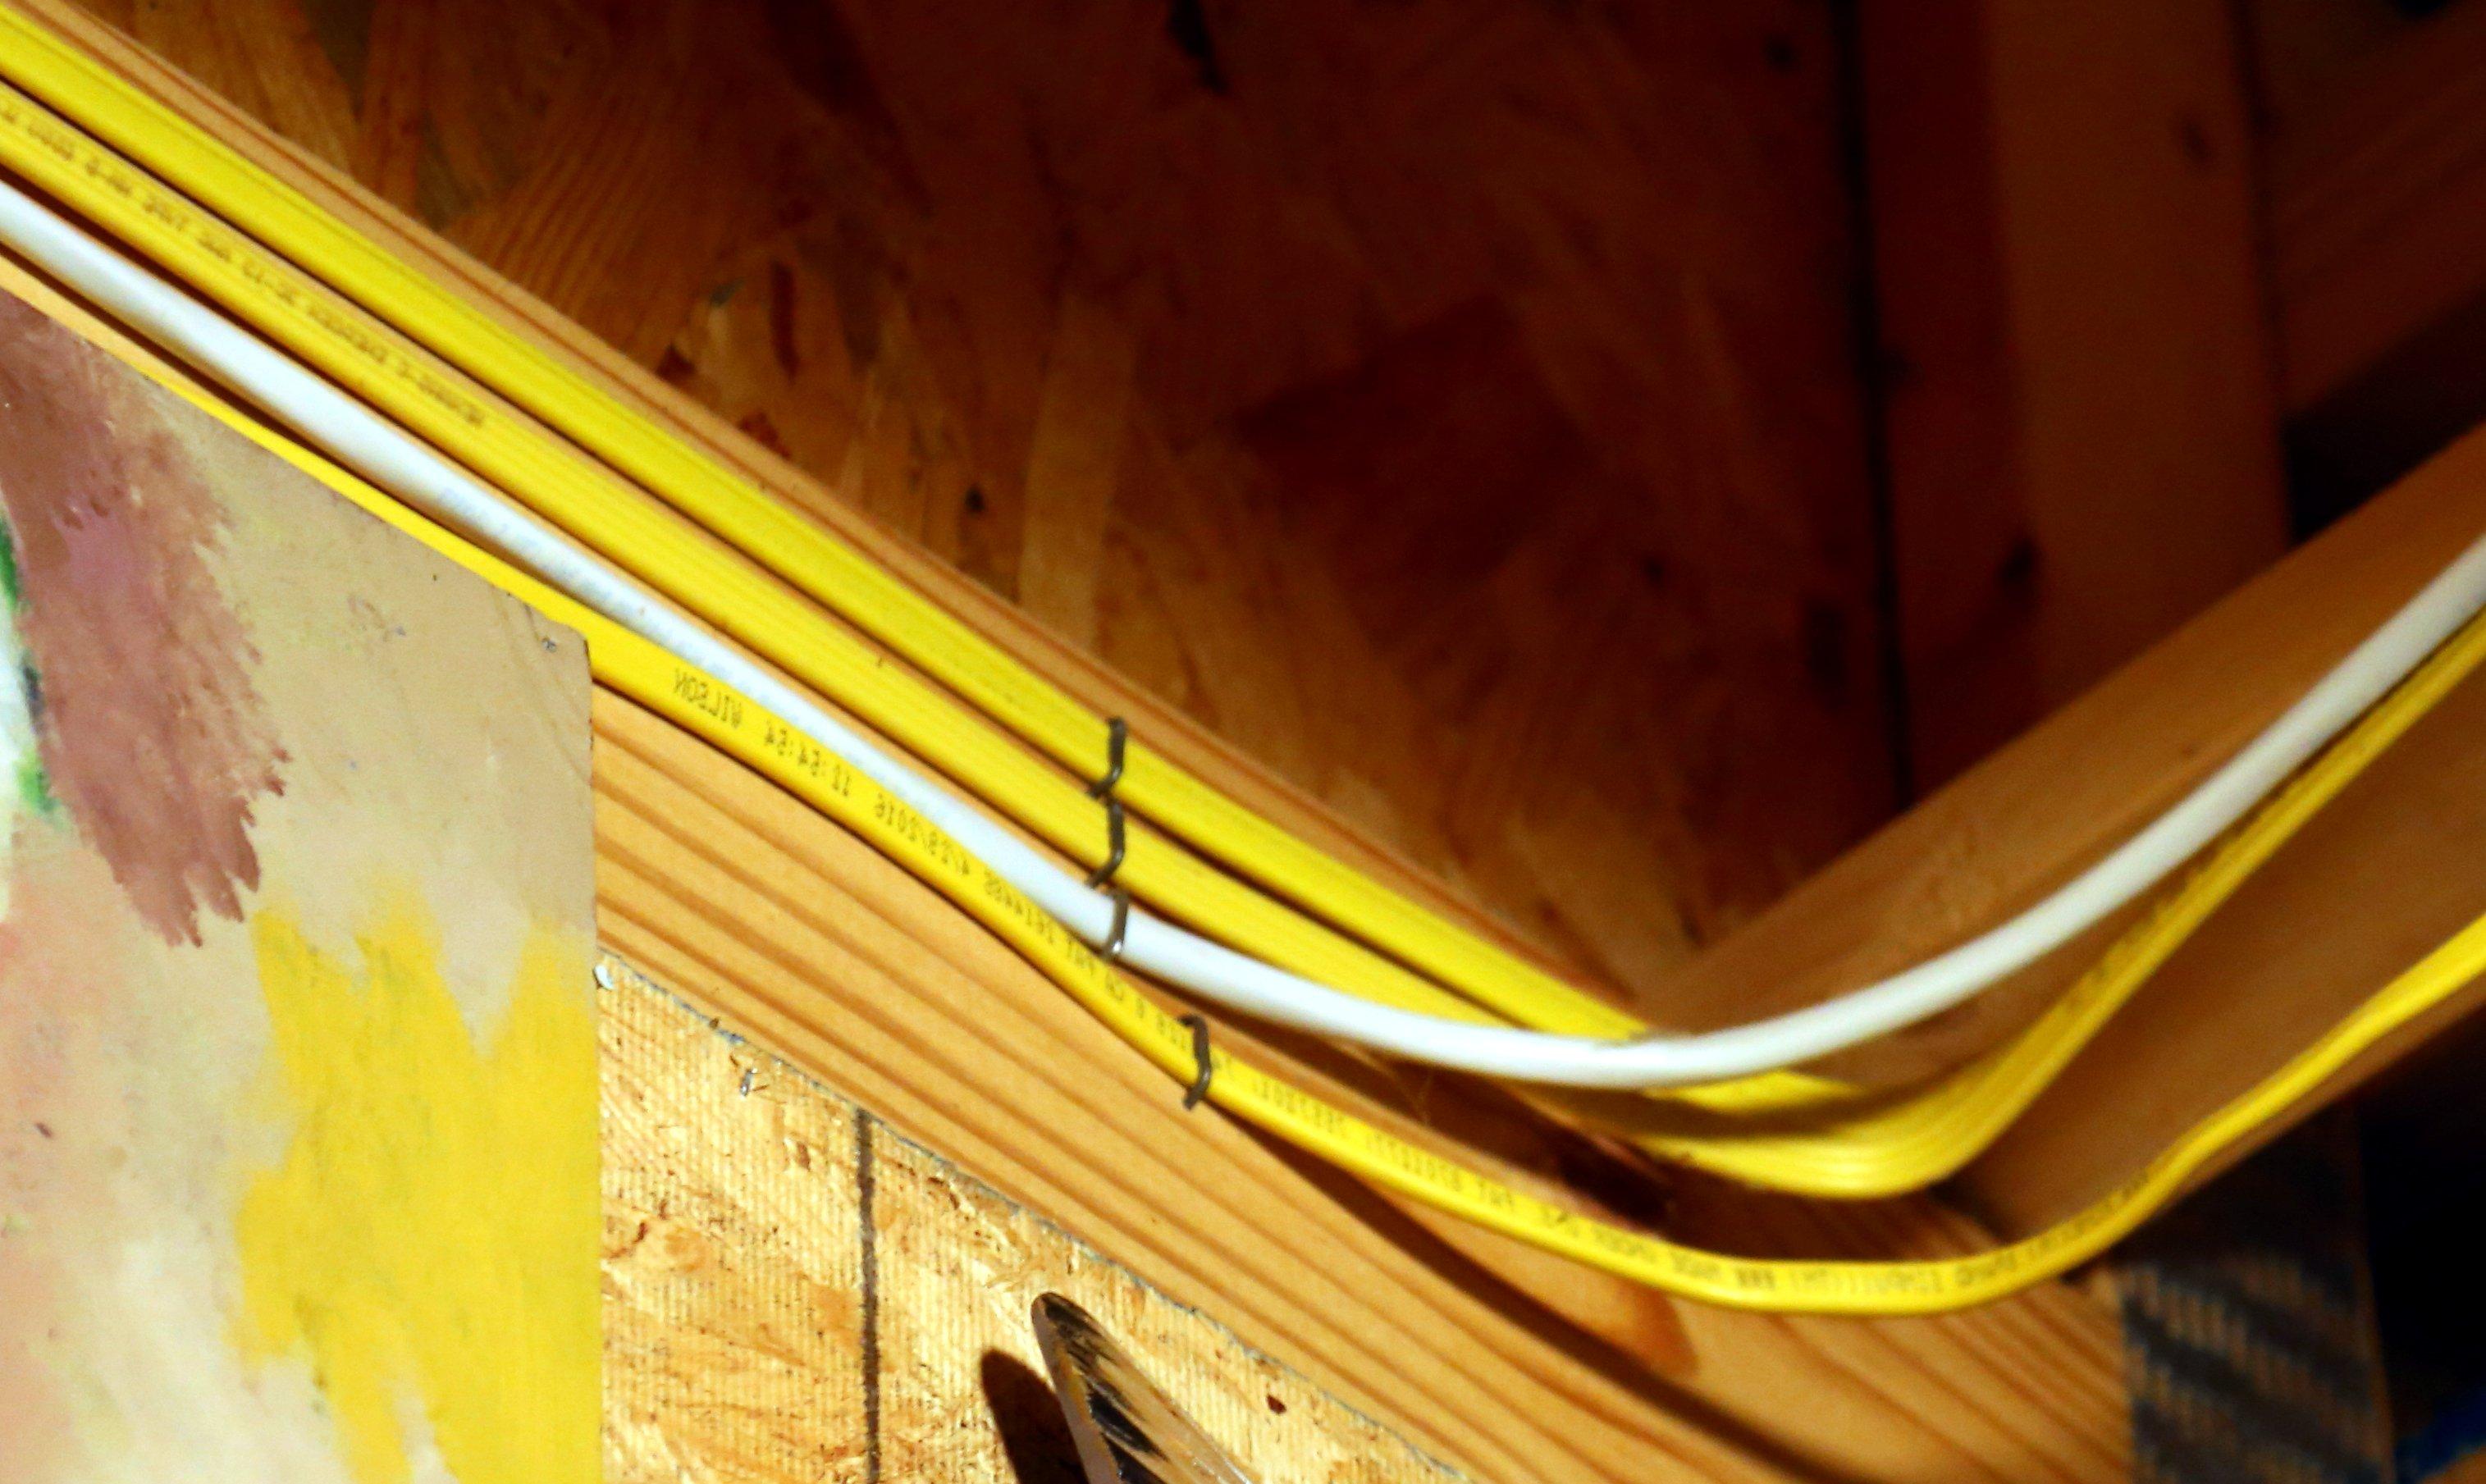 Electrician Wiring in Crofton